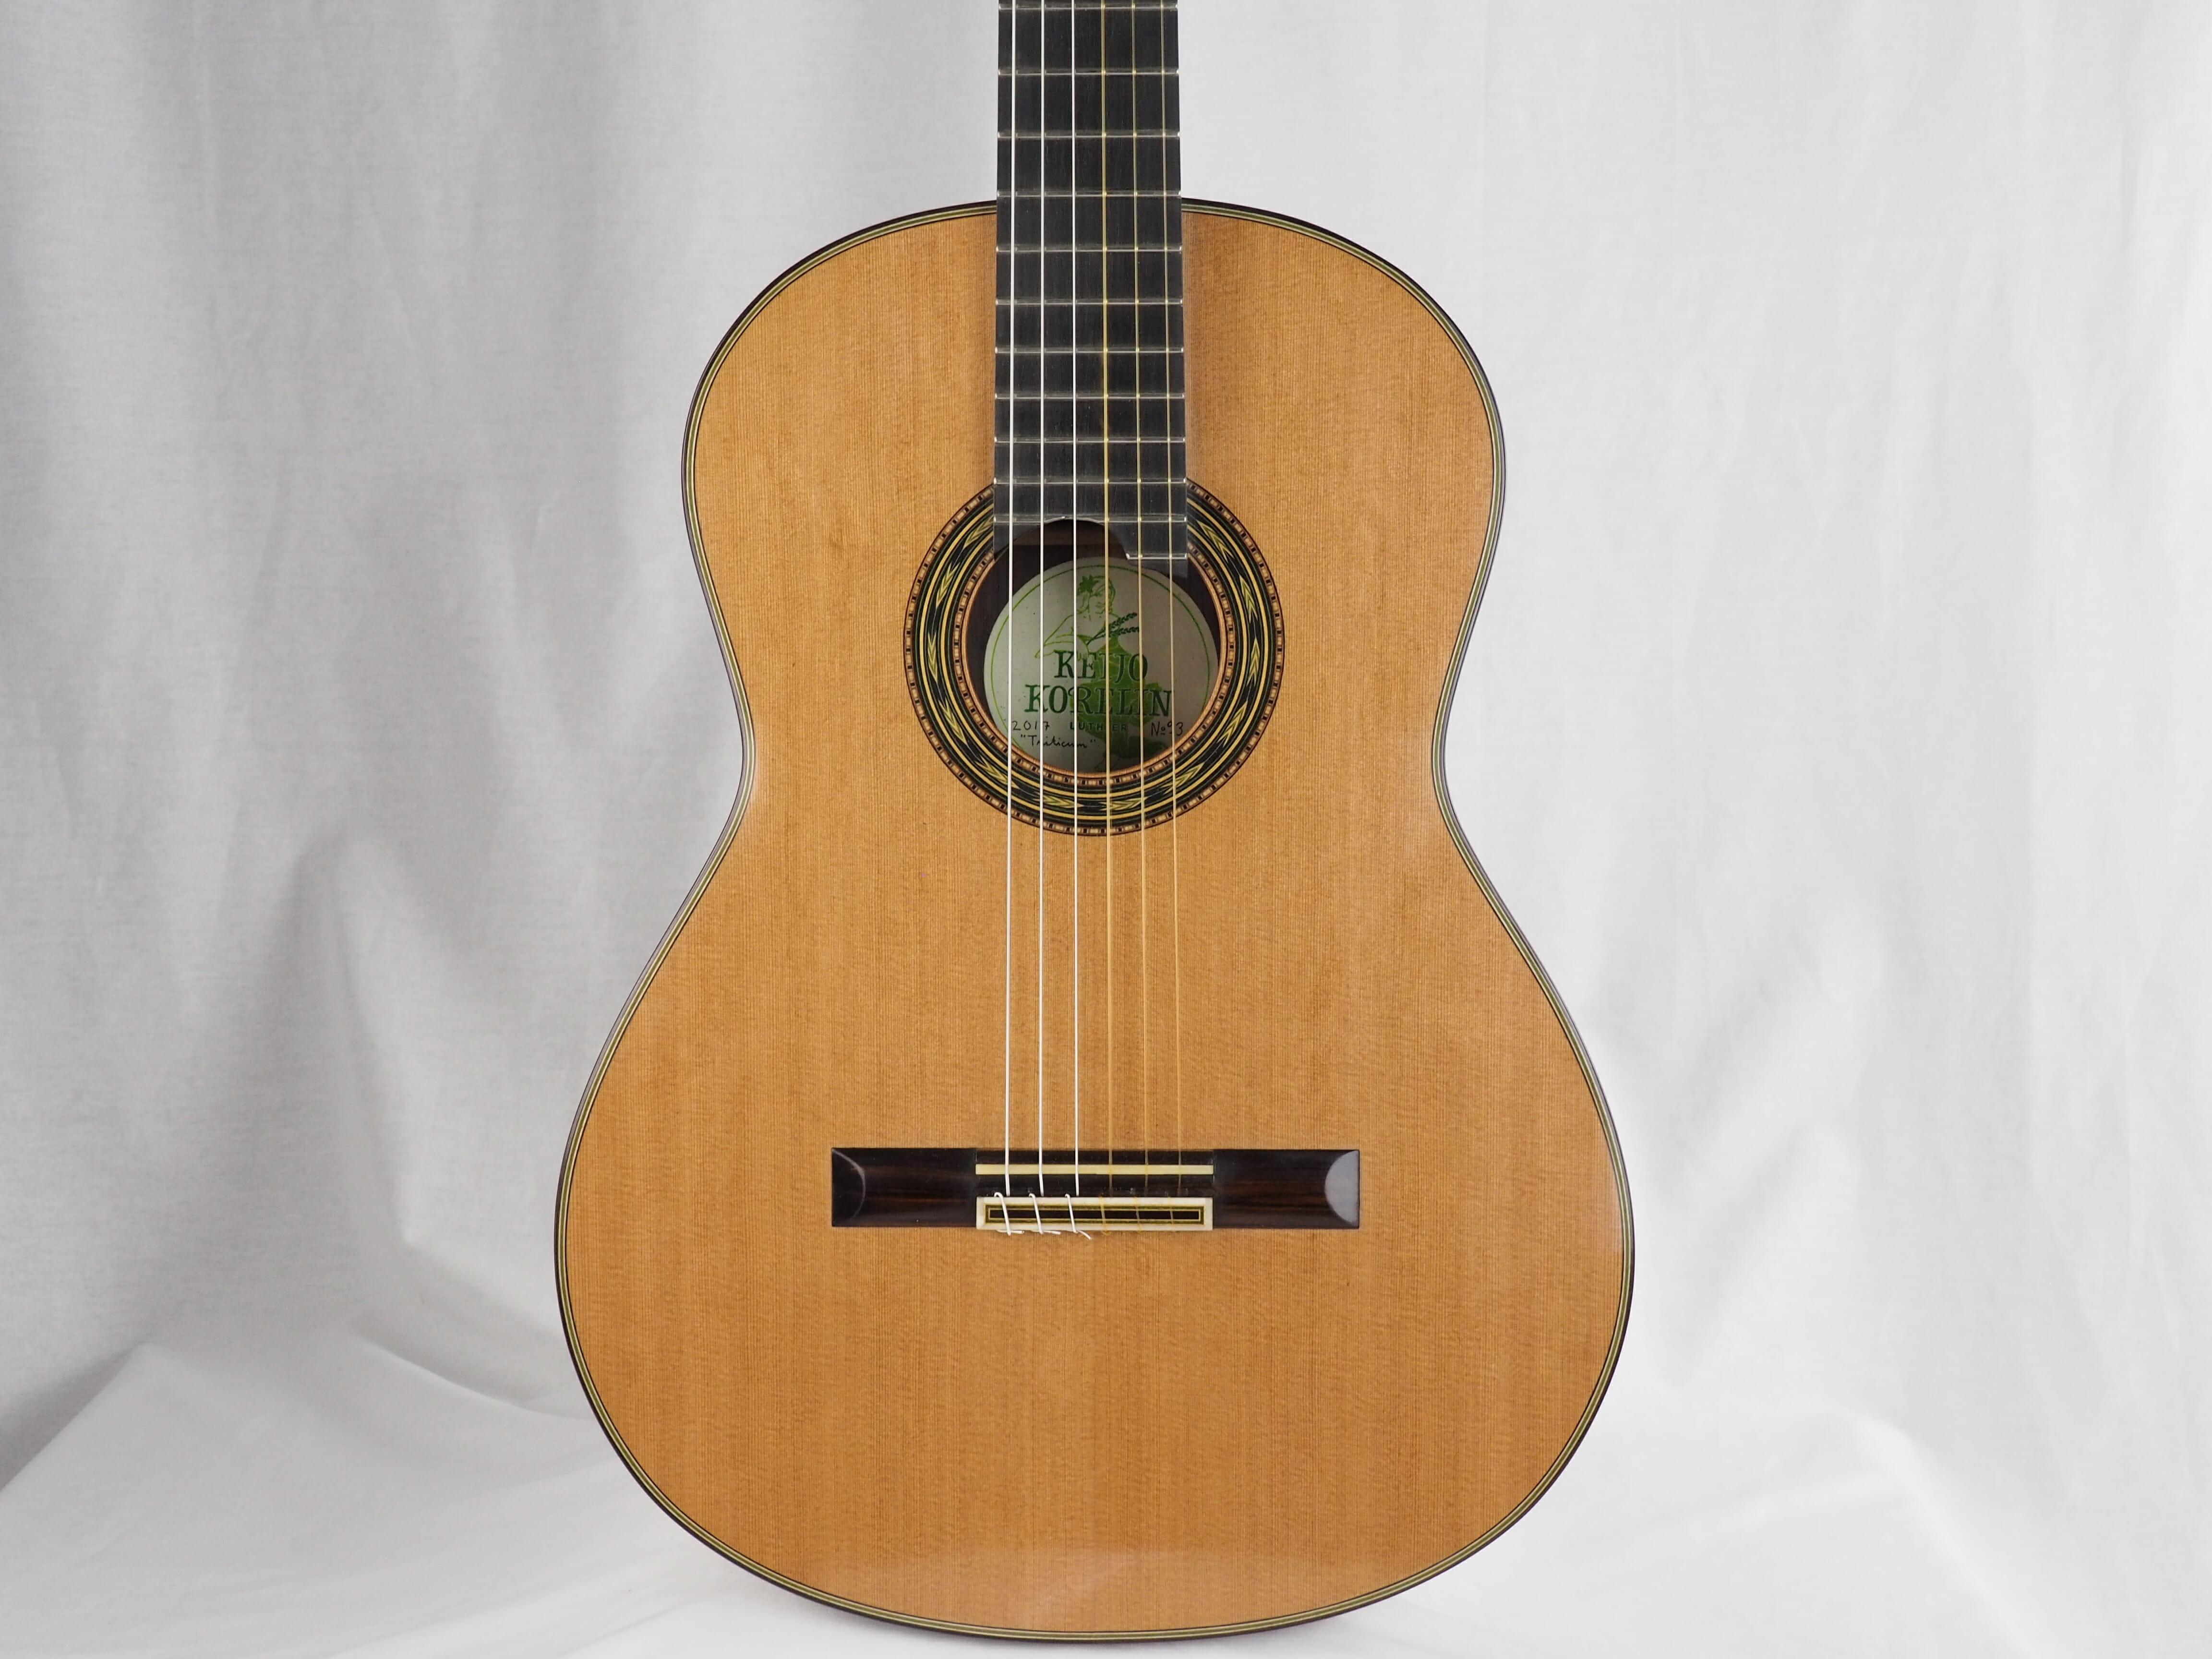 Luthier Keijo Korelin guitare classique double-table 17KOR093-01